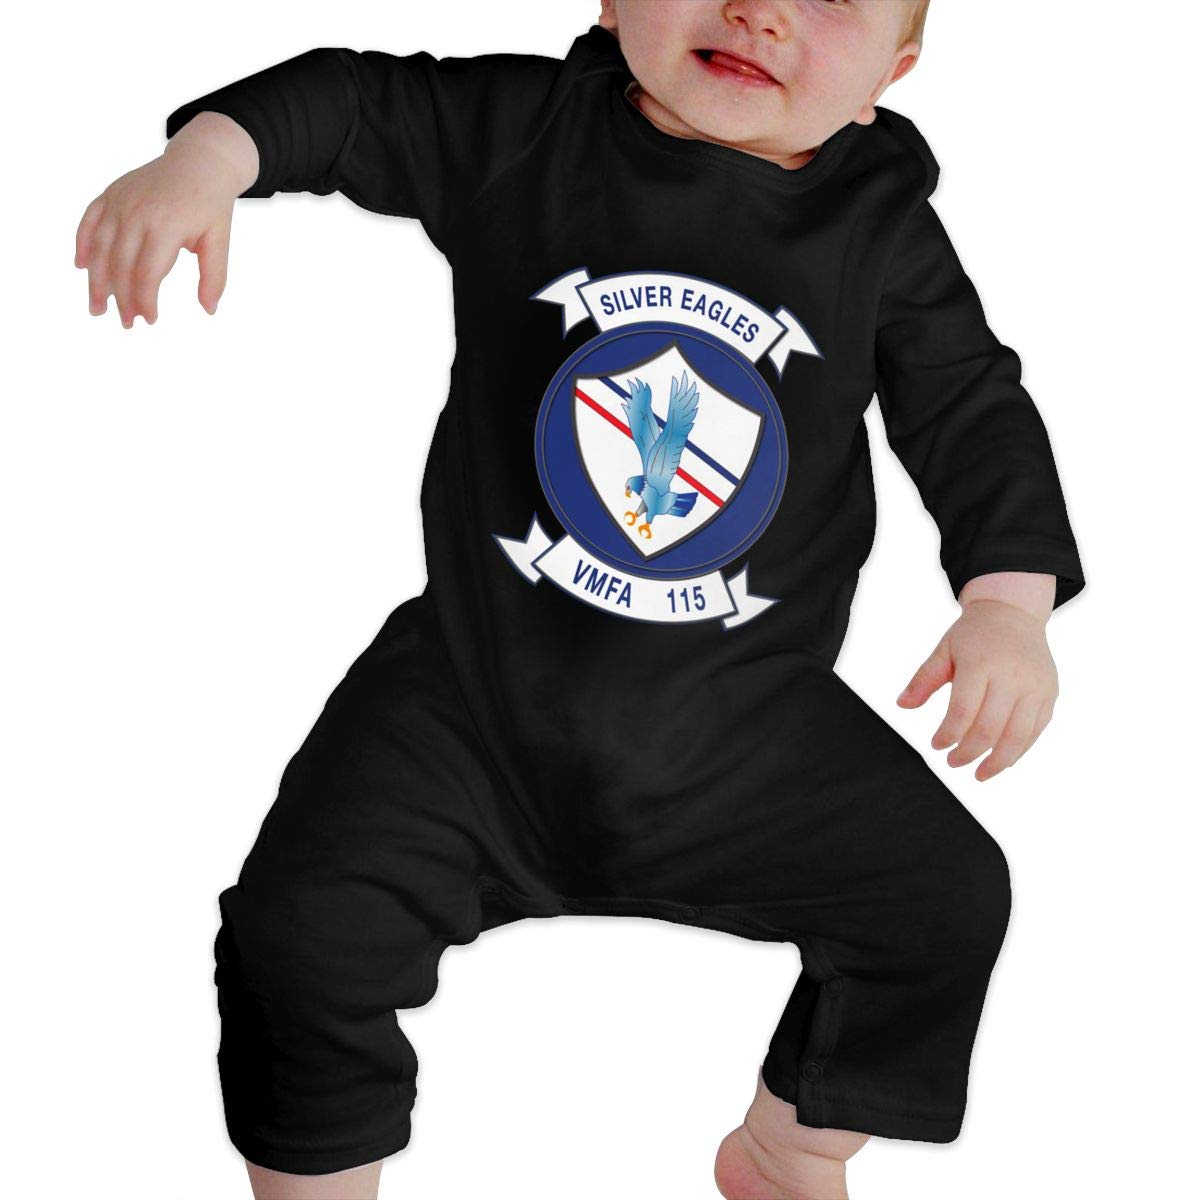 Gsaa USMC Vmfa 115 Baby Long Sleeve Bodysuit Cotton Romper